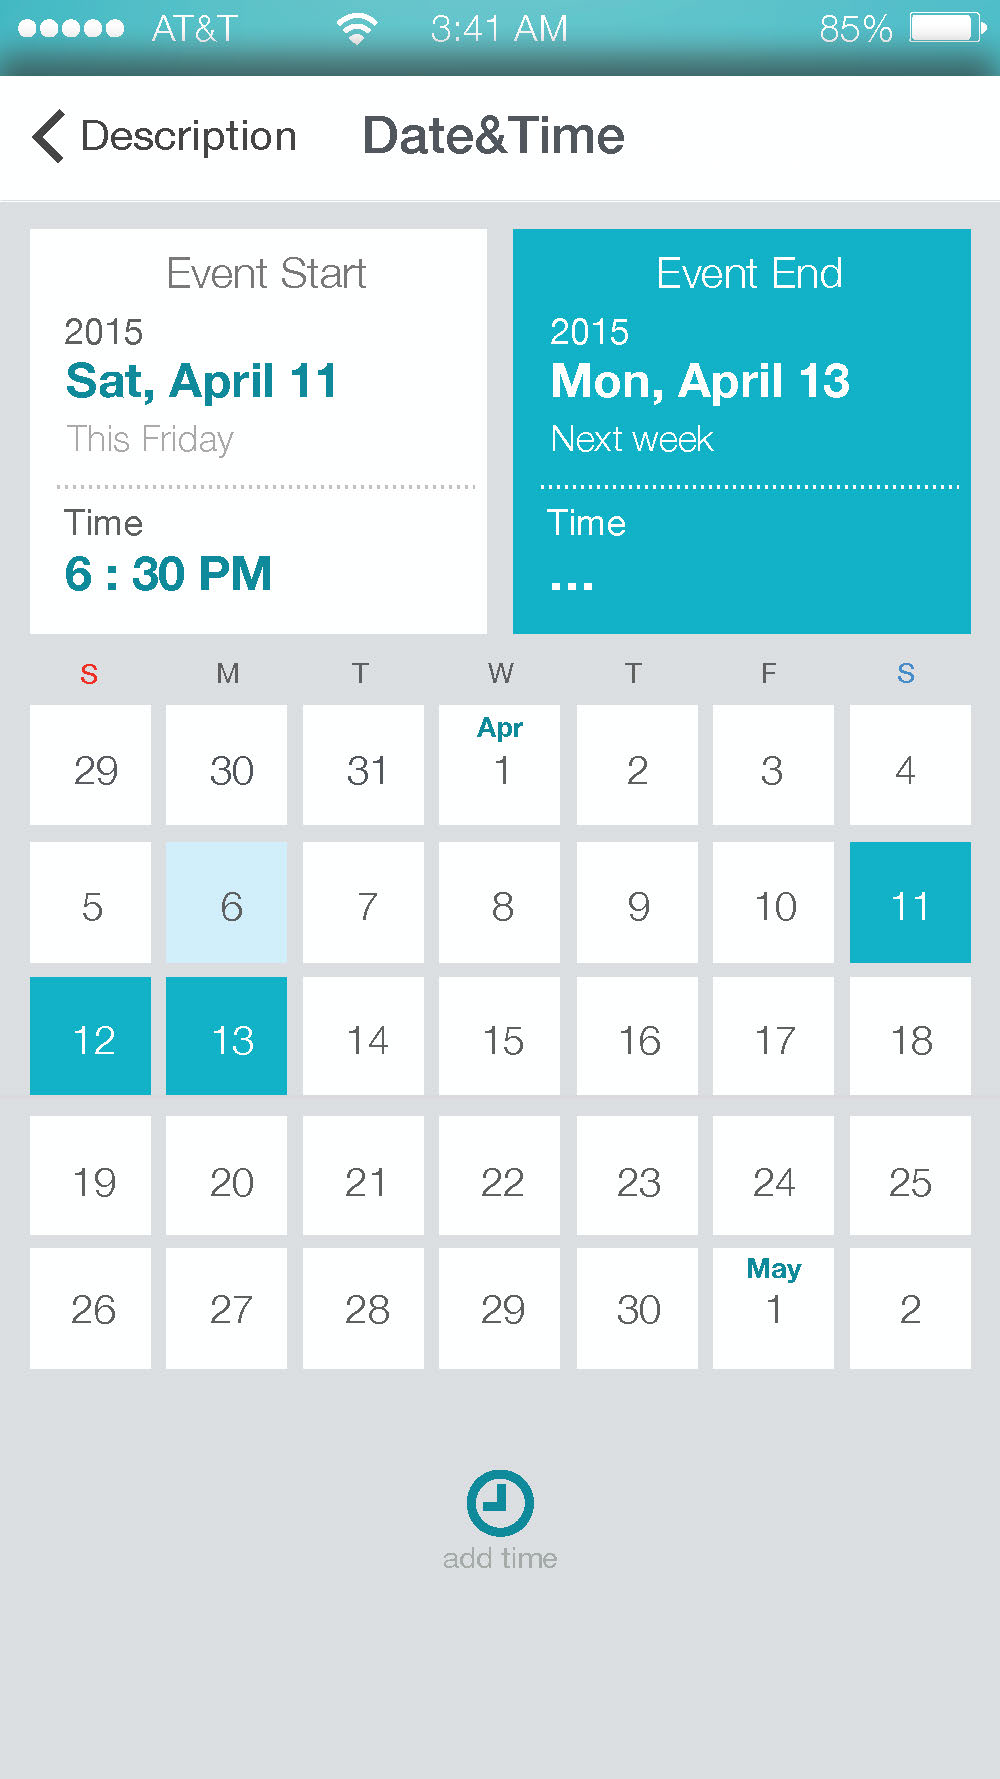 Invite_iphone6_9_Page_69.jpg